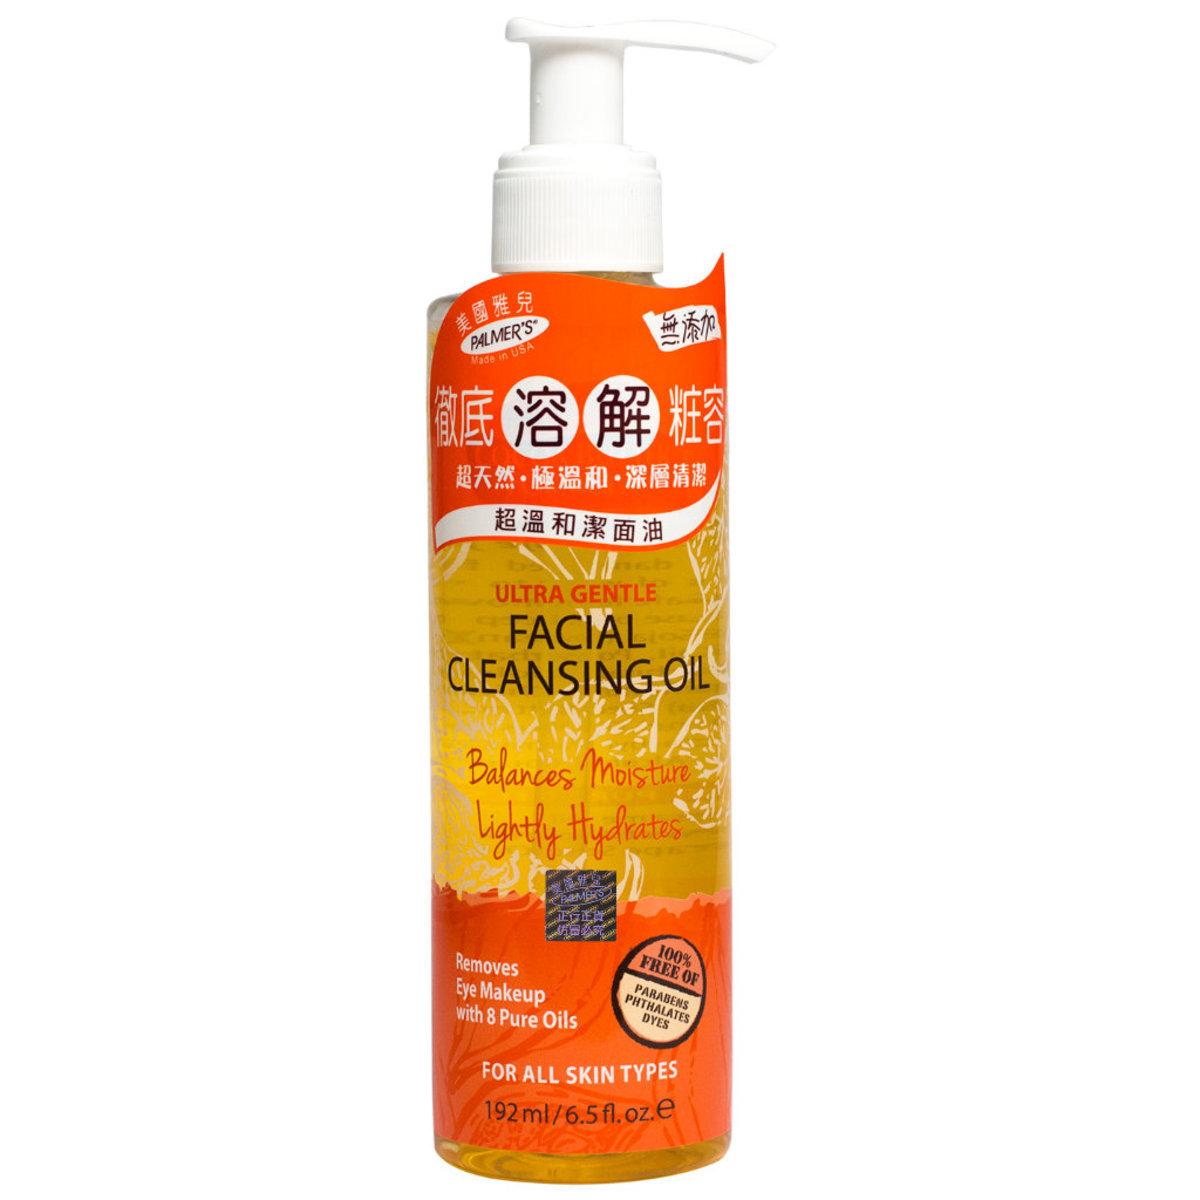 美國雅兒PALMER'S - 超溫和潔面油 192ml - Palmer's Ultra Gentle Facial Cleansing Oil